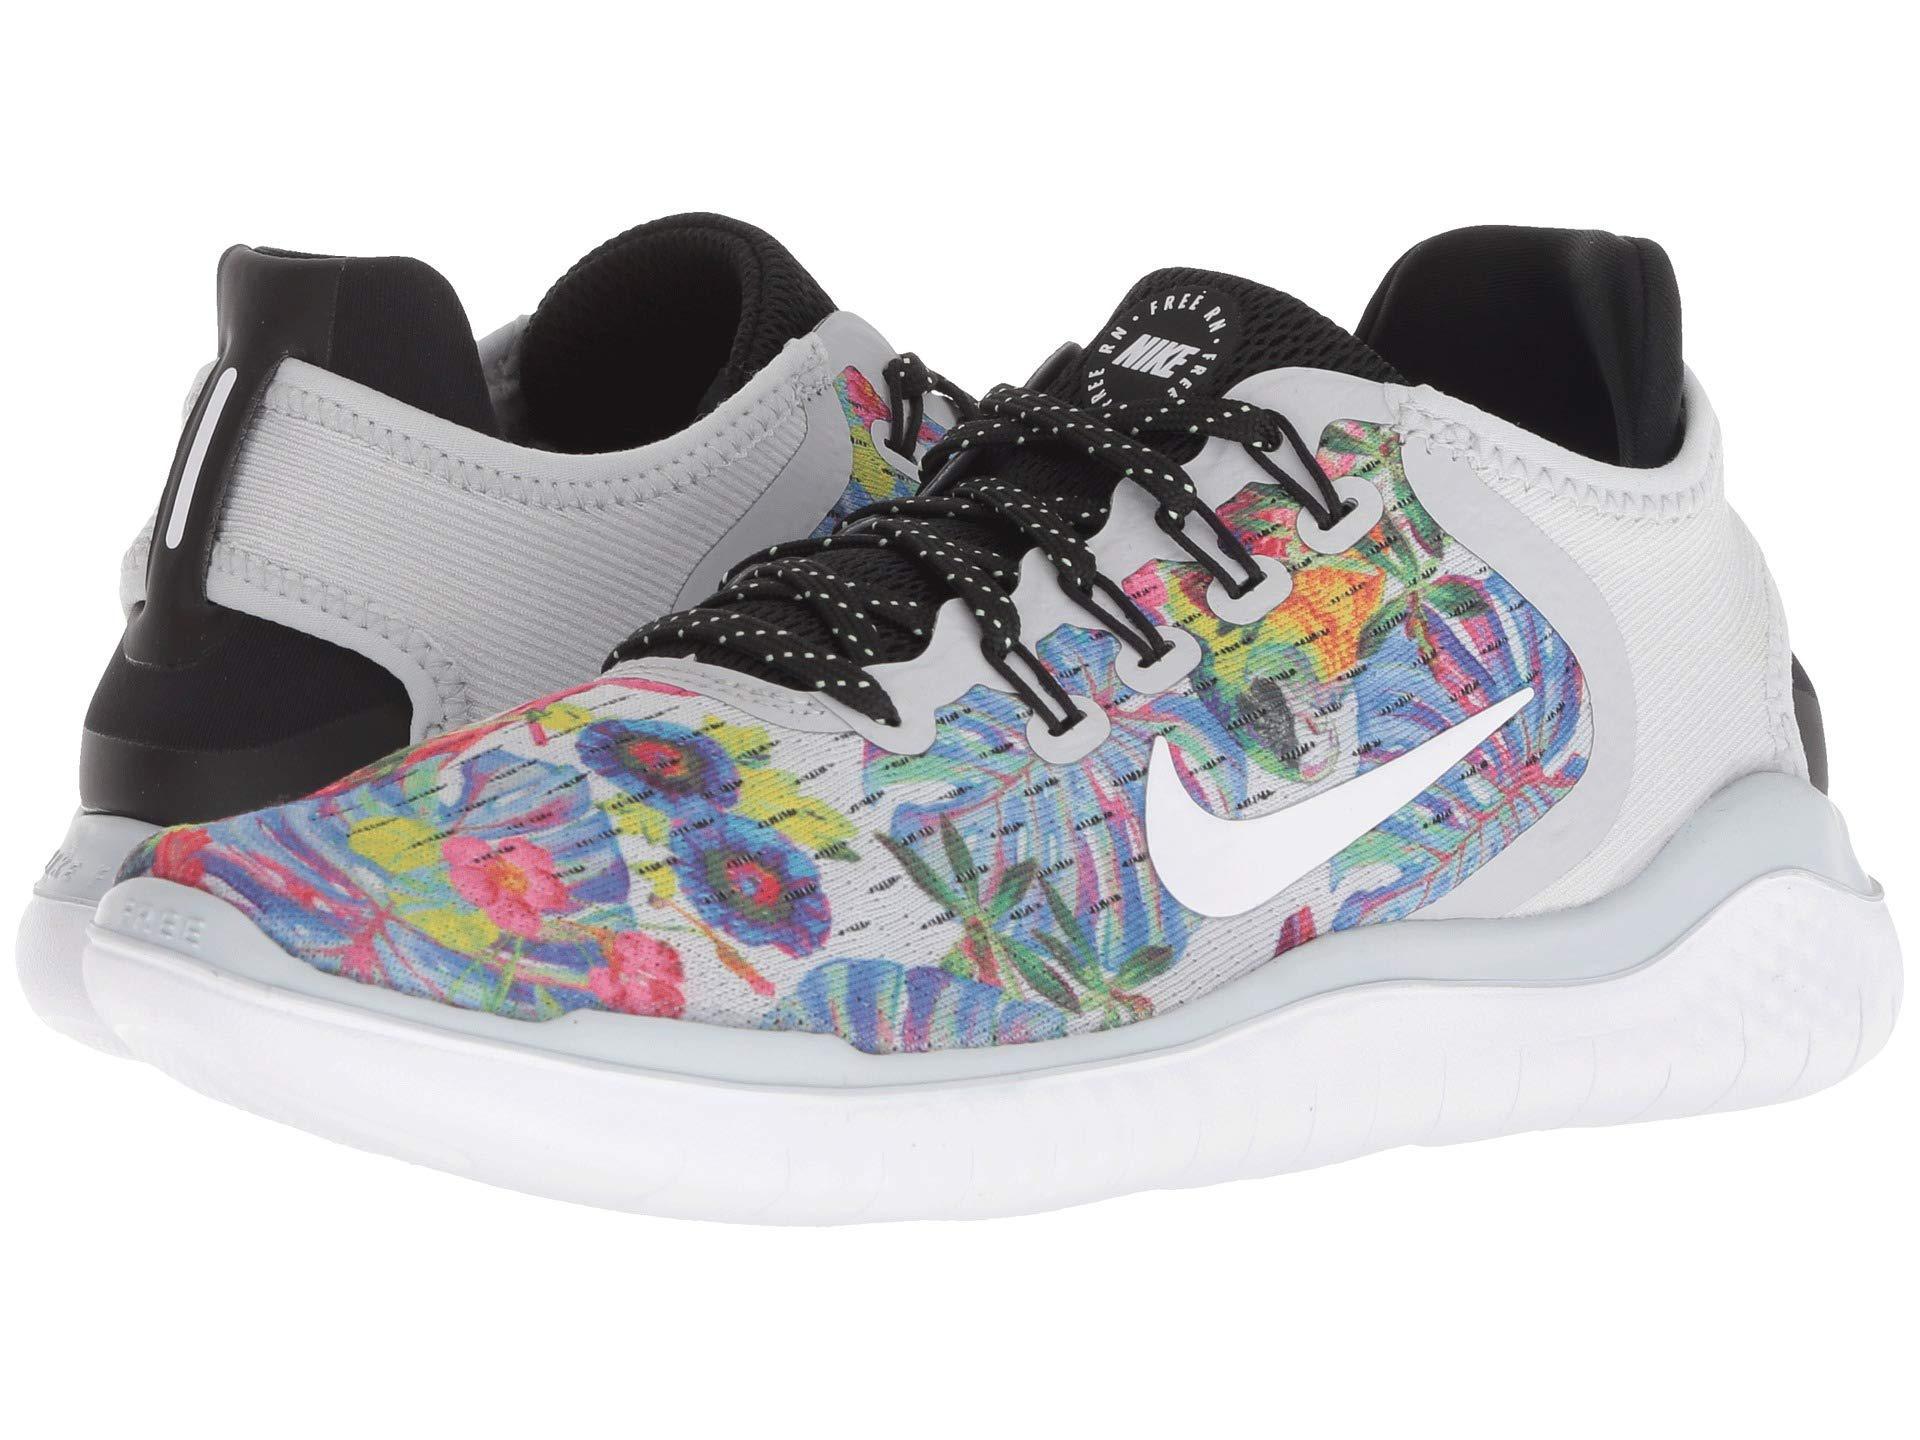 online retailer 8c534 edd69 Nike Free Rn 2018 Gpx Rs (pure Platinum white black) Women s Running ...